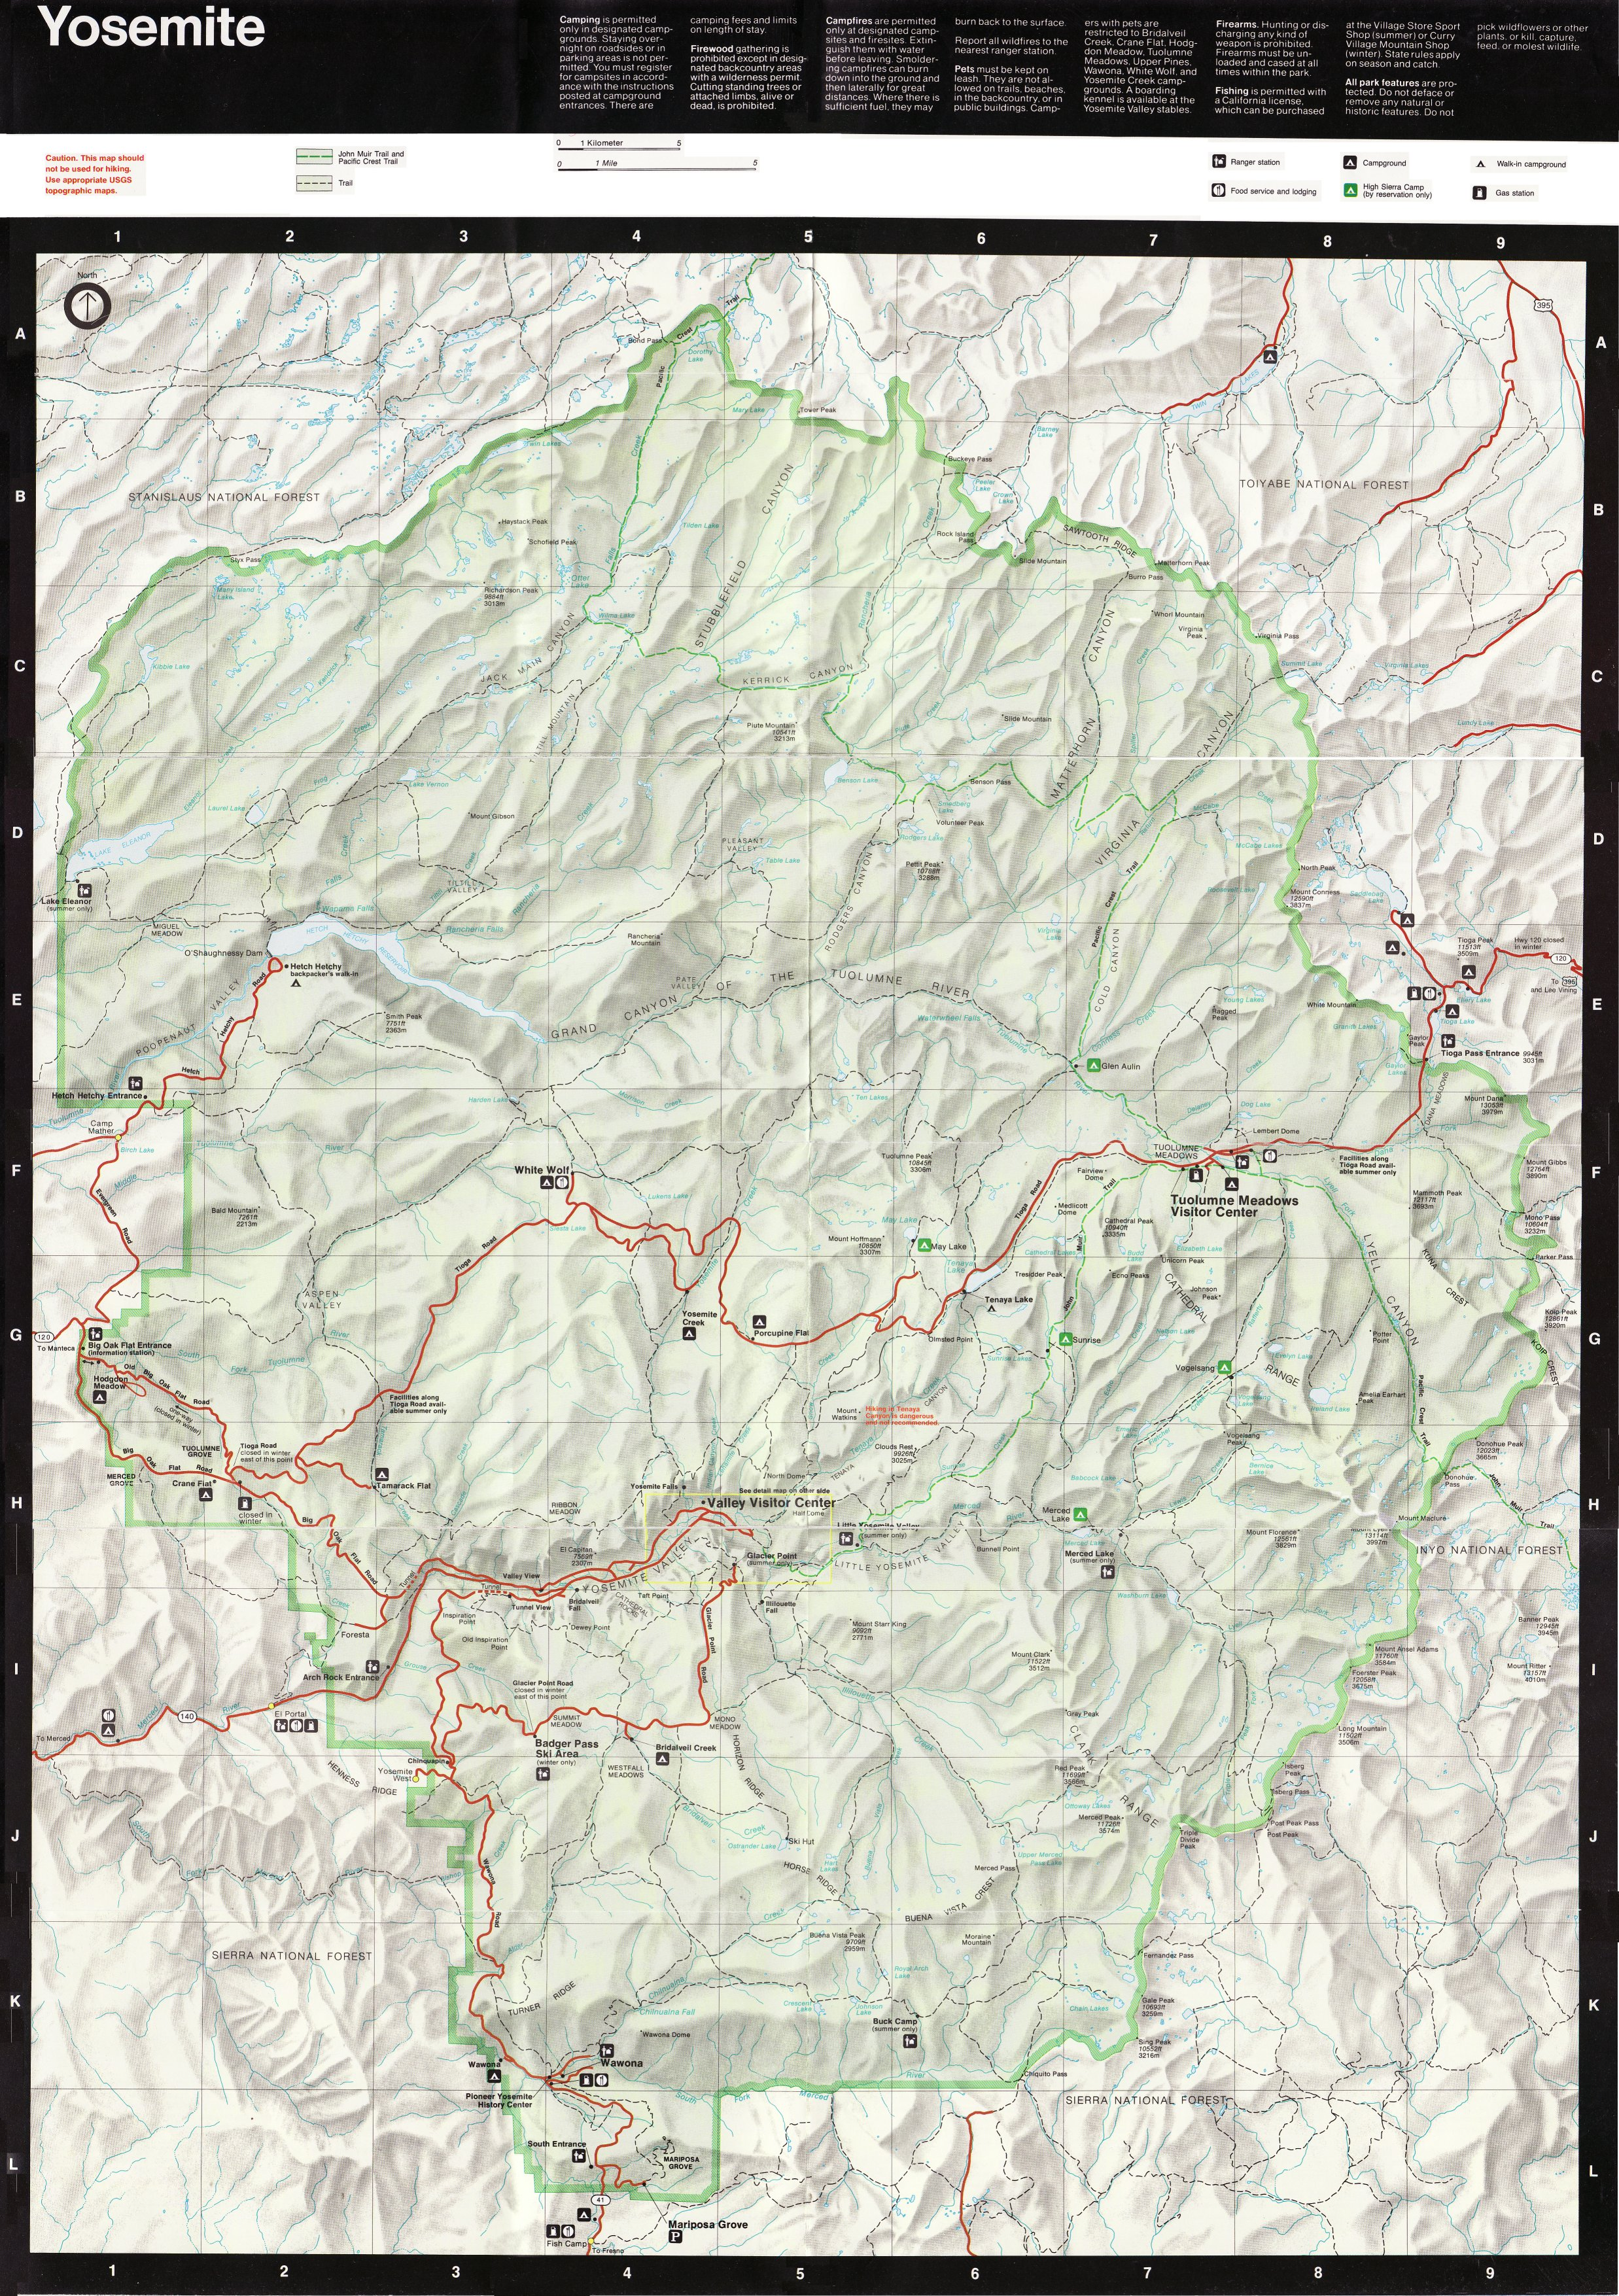 Yosemite National Park Yosemite Historic